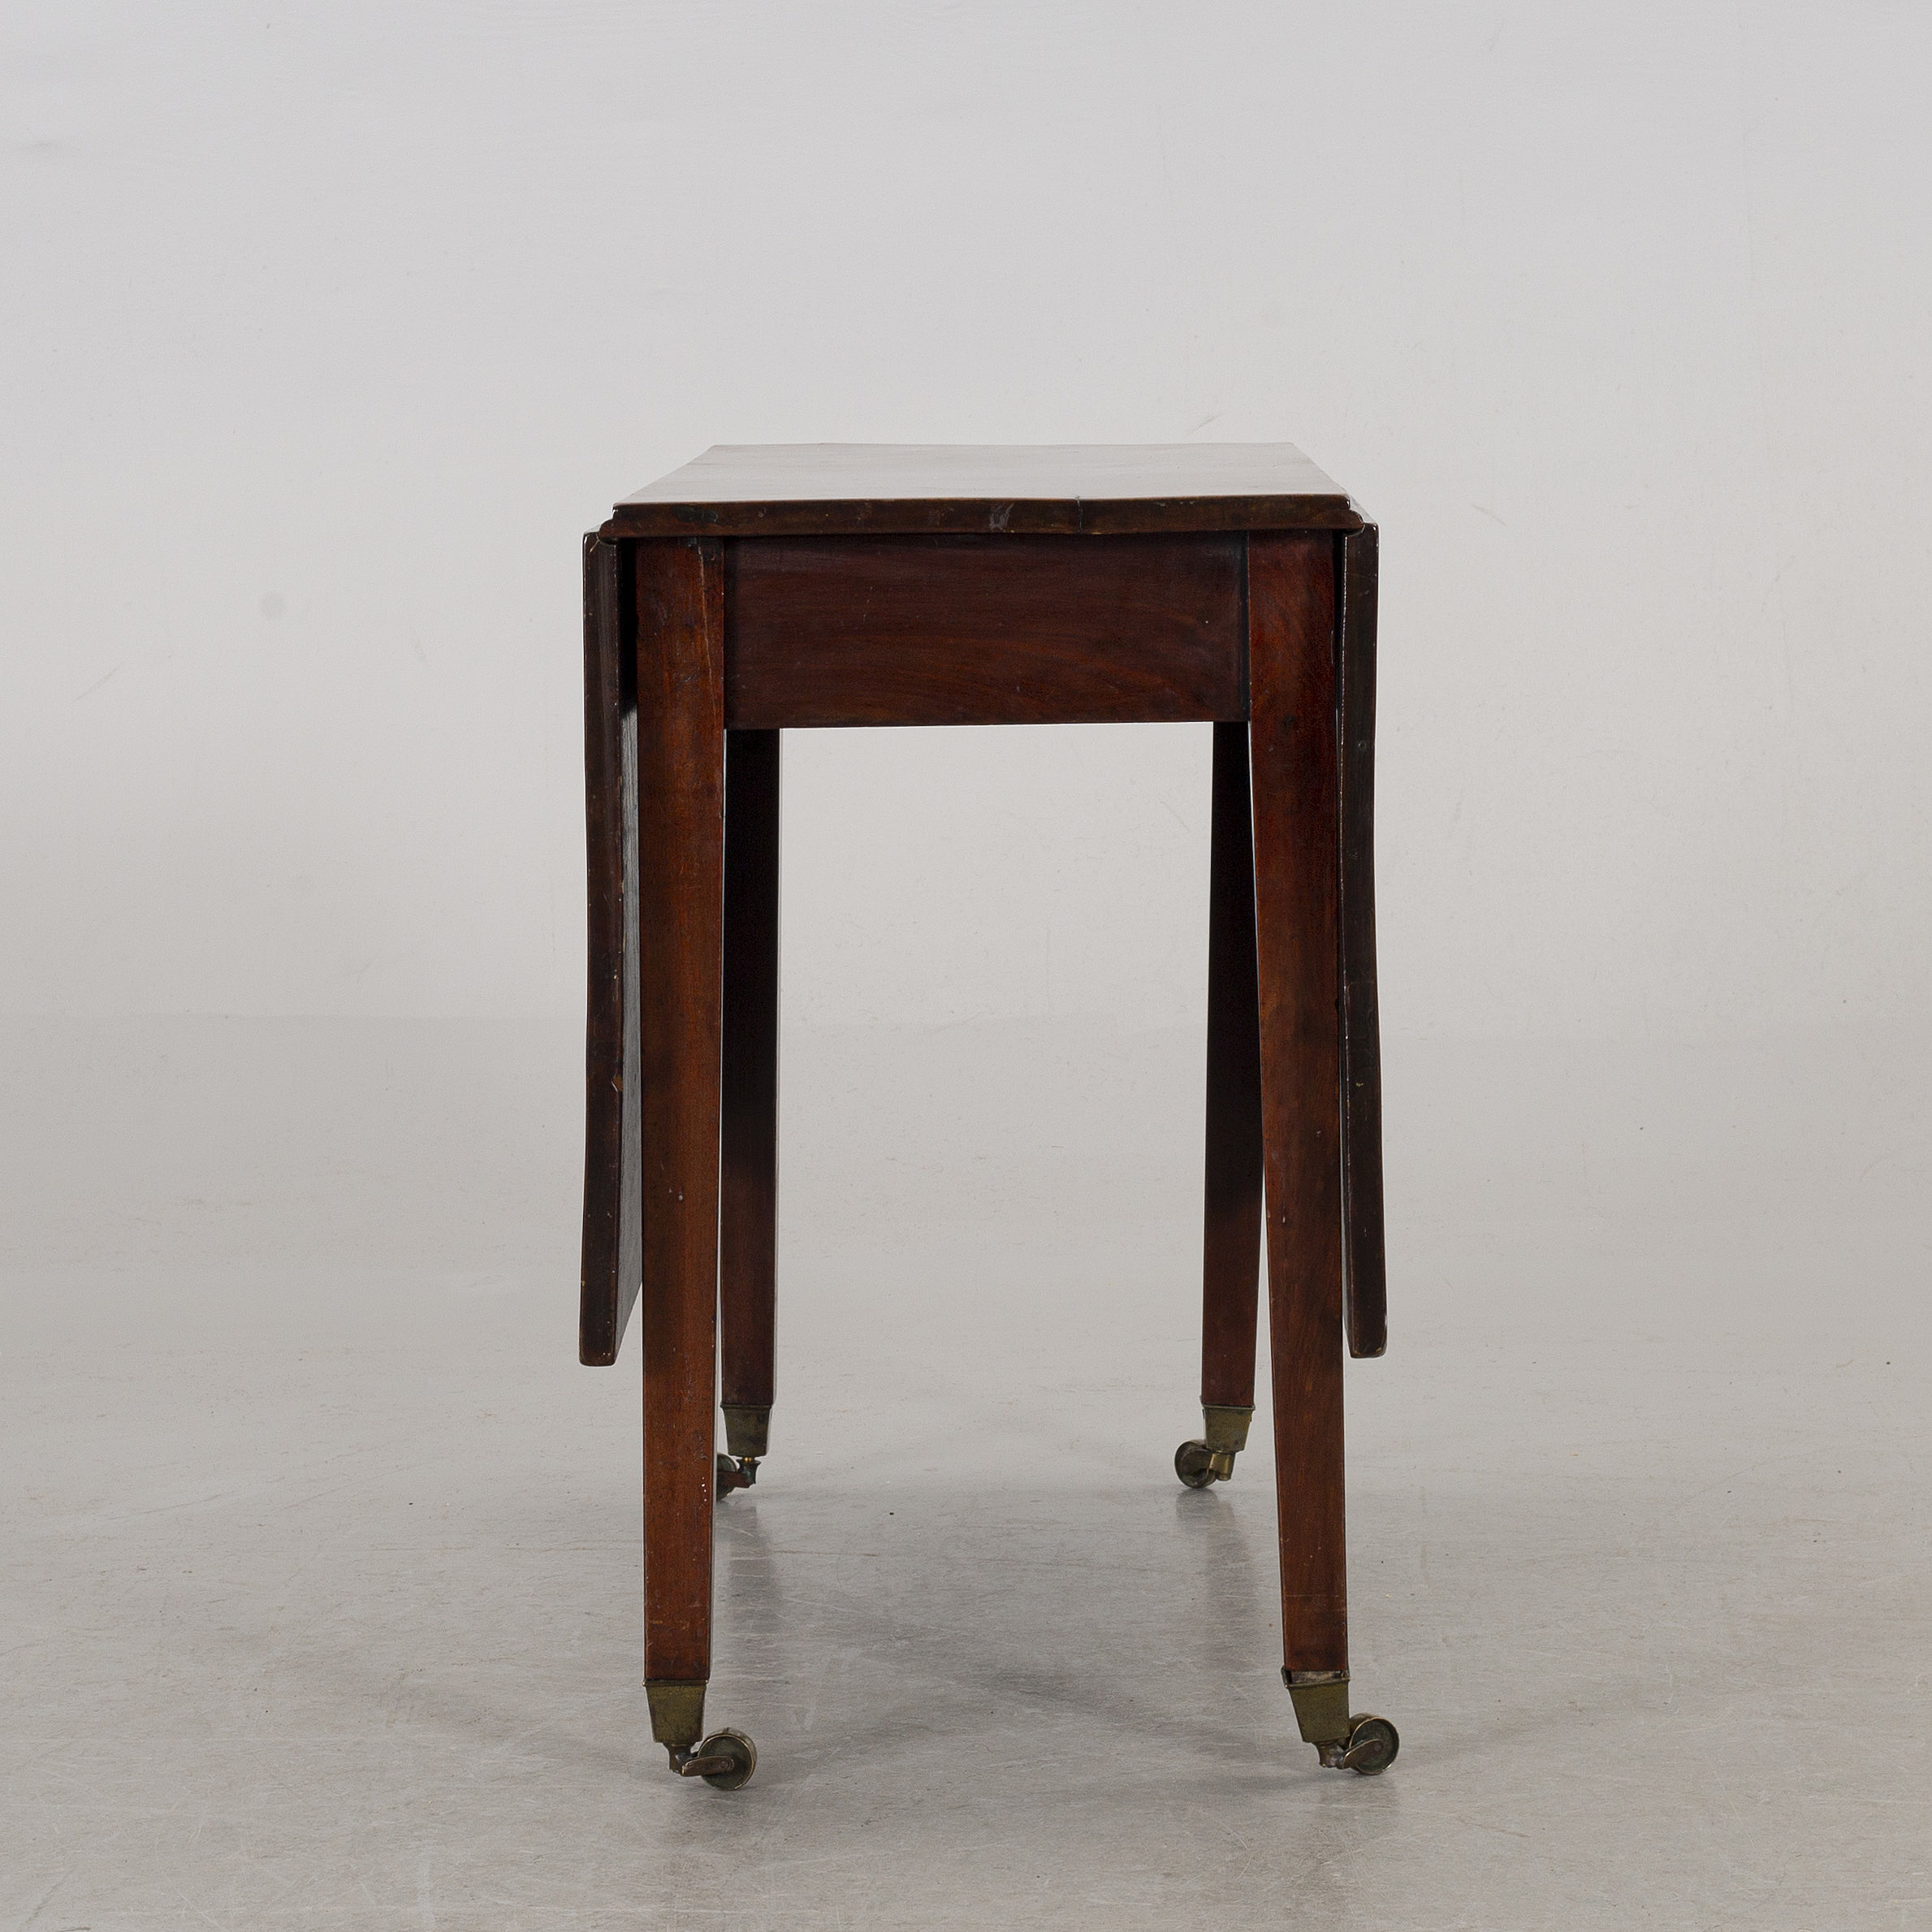 An English 19th century table  - Bukowskis